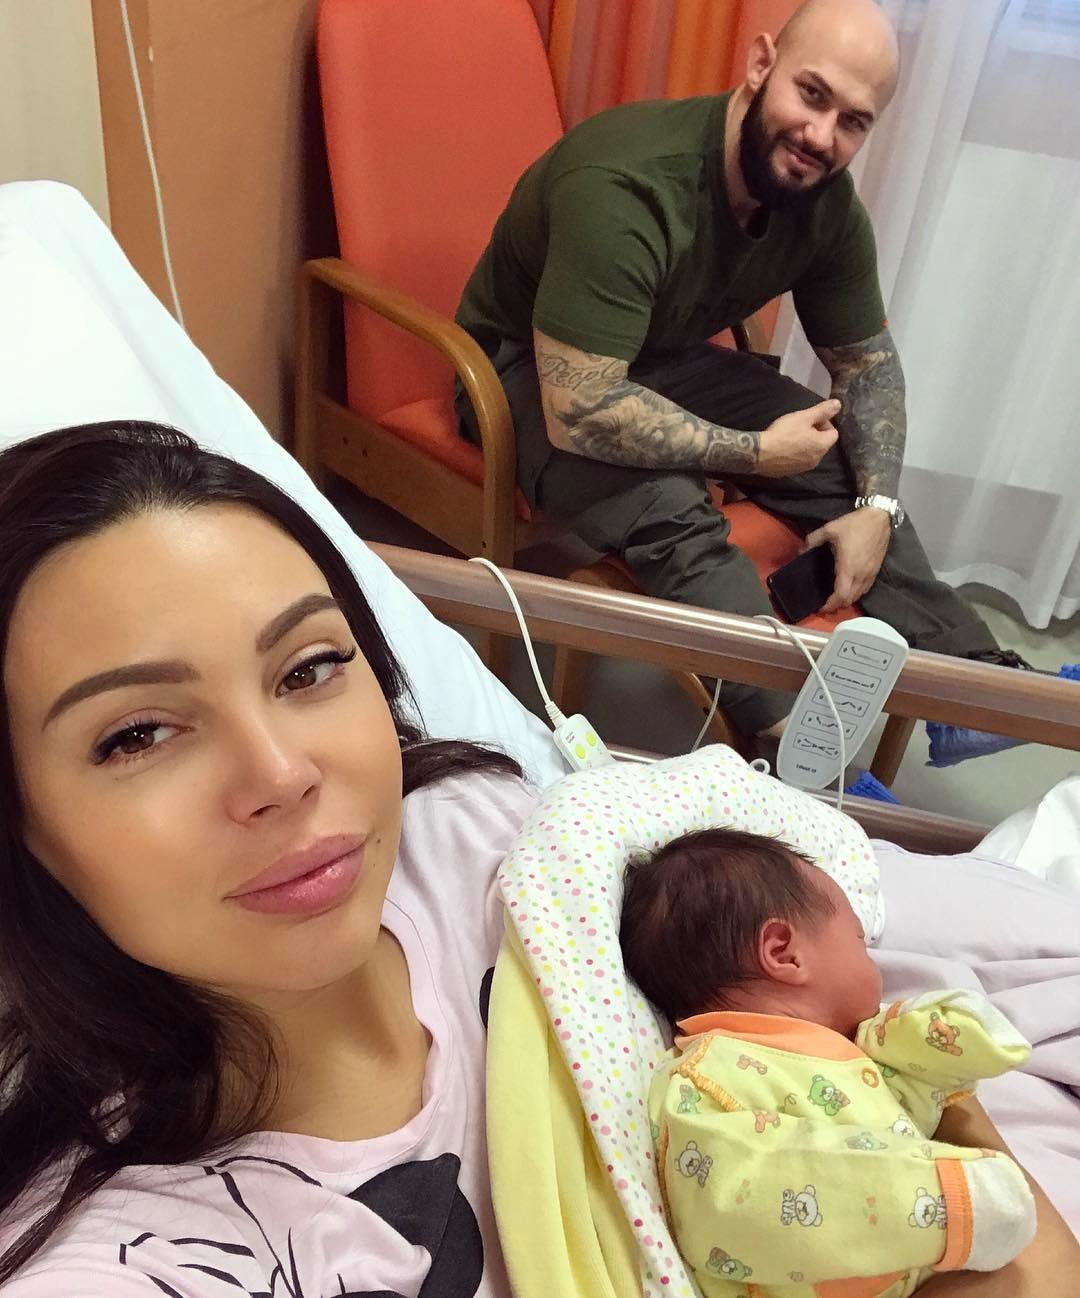 http://st-sh-2.woman.ru/images/gallery/6/3/g_63beefa5db5d72e8c207e149e8d34a7b.jpg